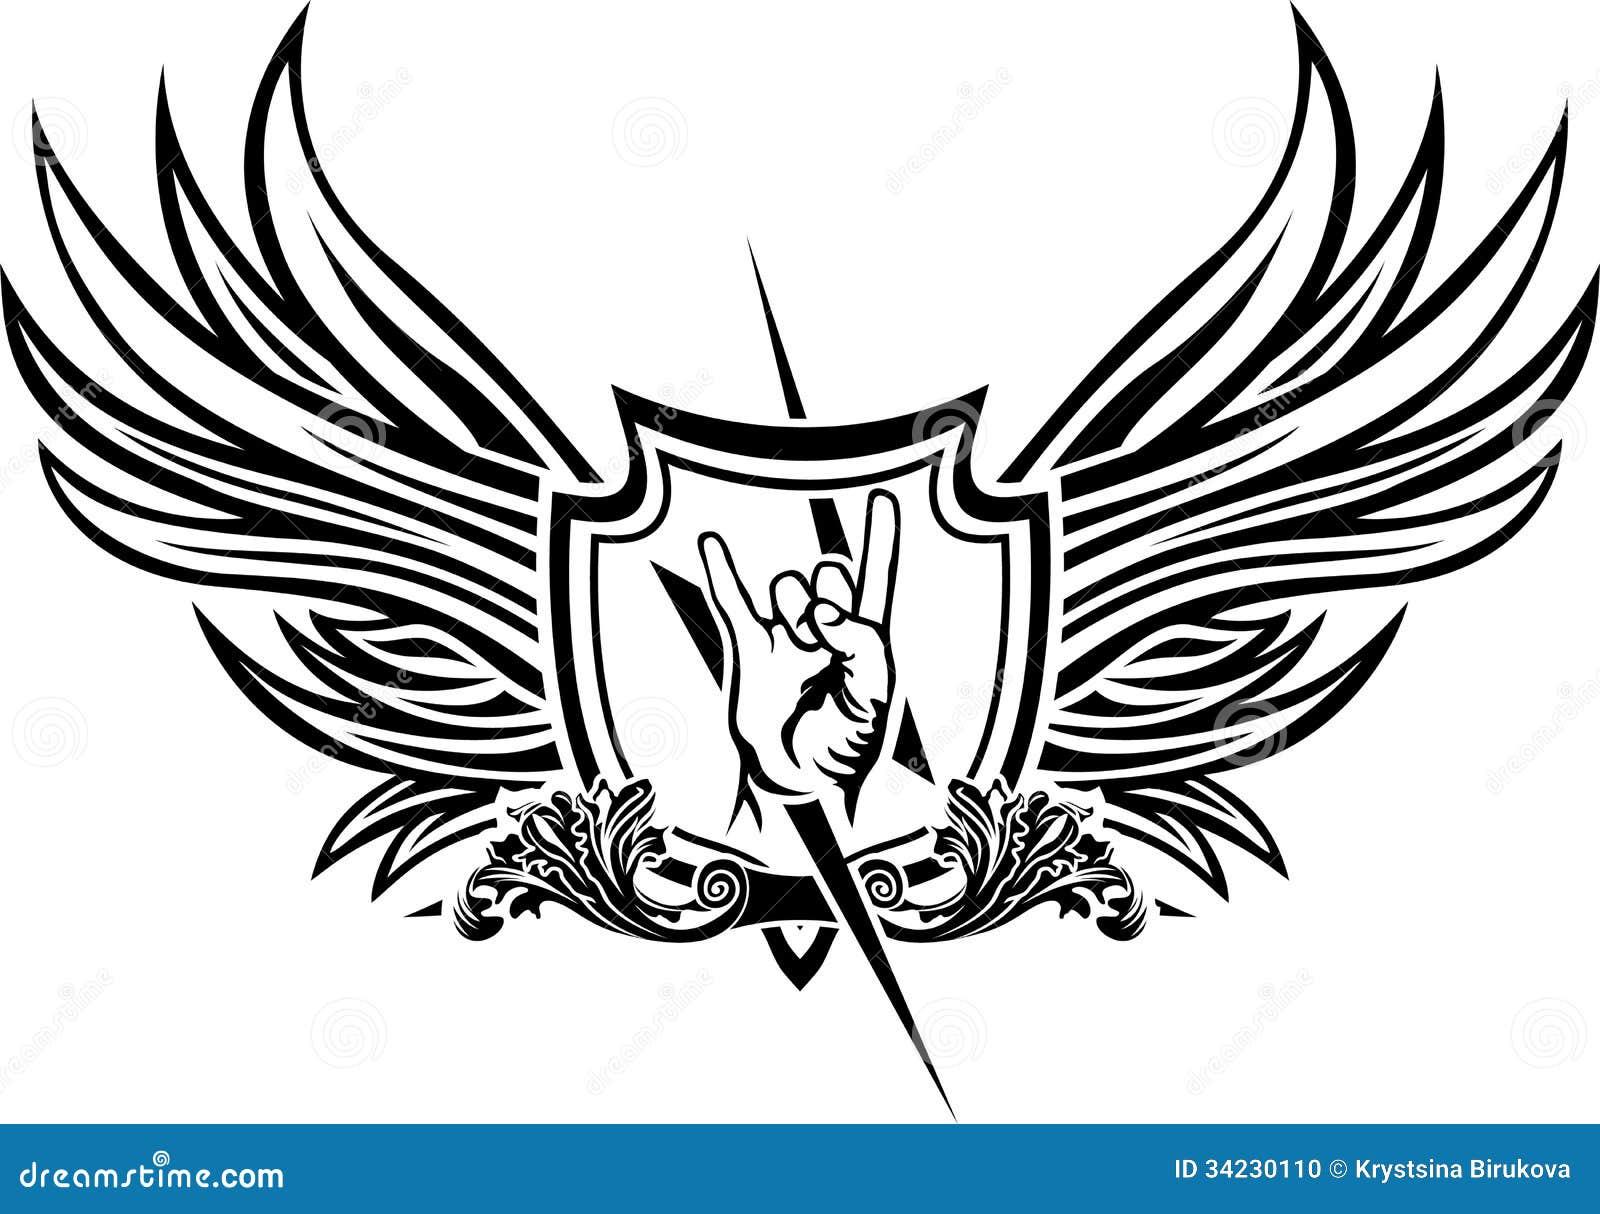 Vector symbol of rock n roll stock vector illustration of rock vector symbol of rock n roll buycottarizona